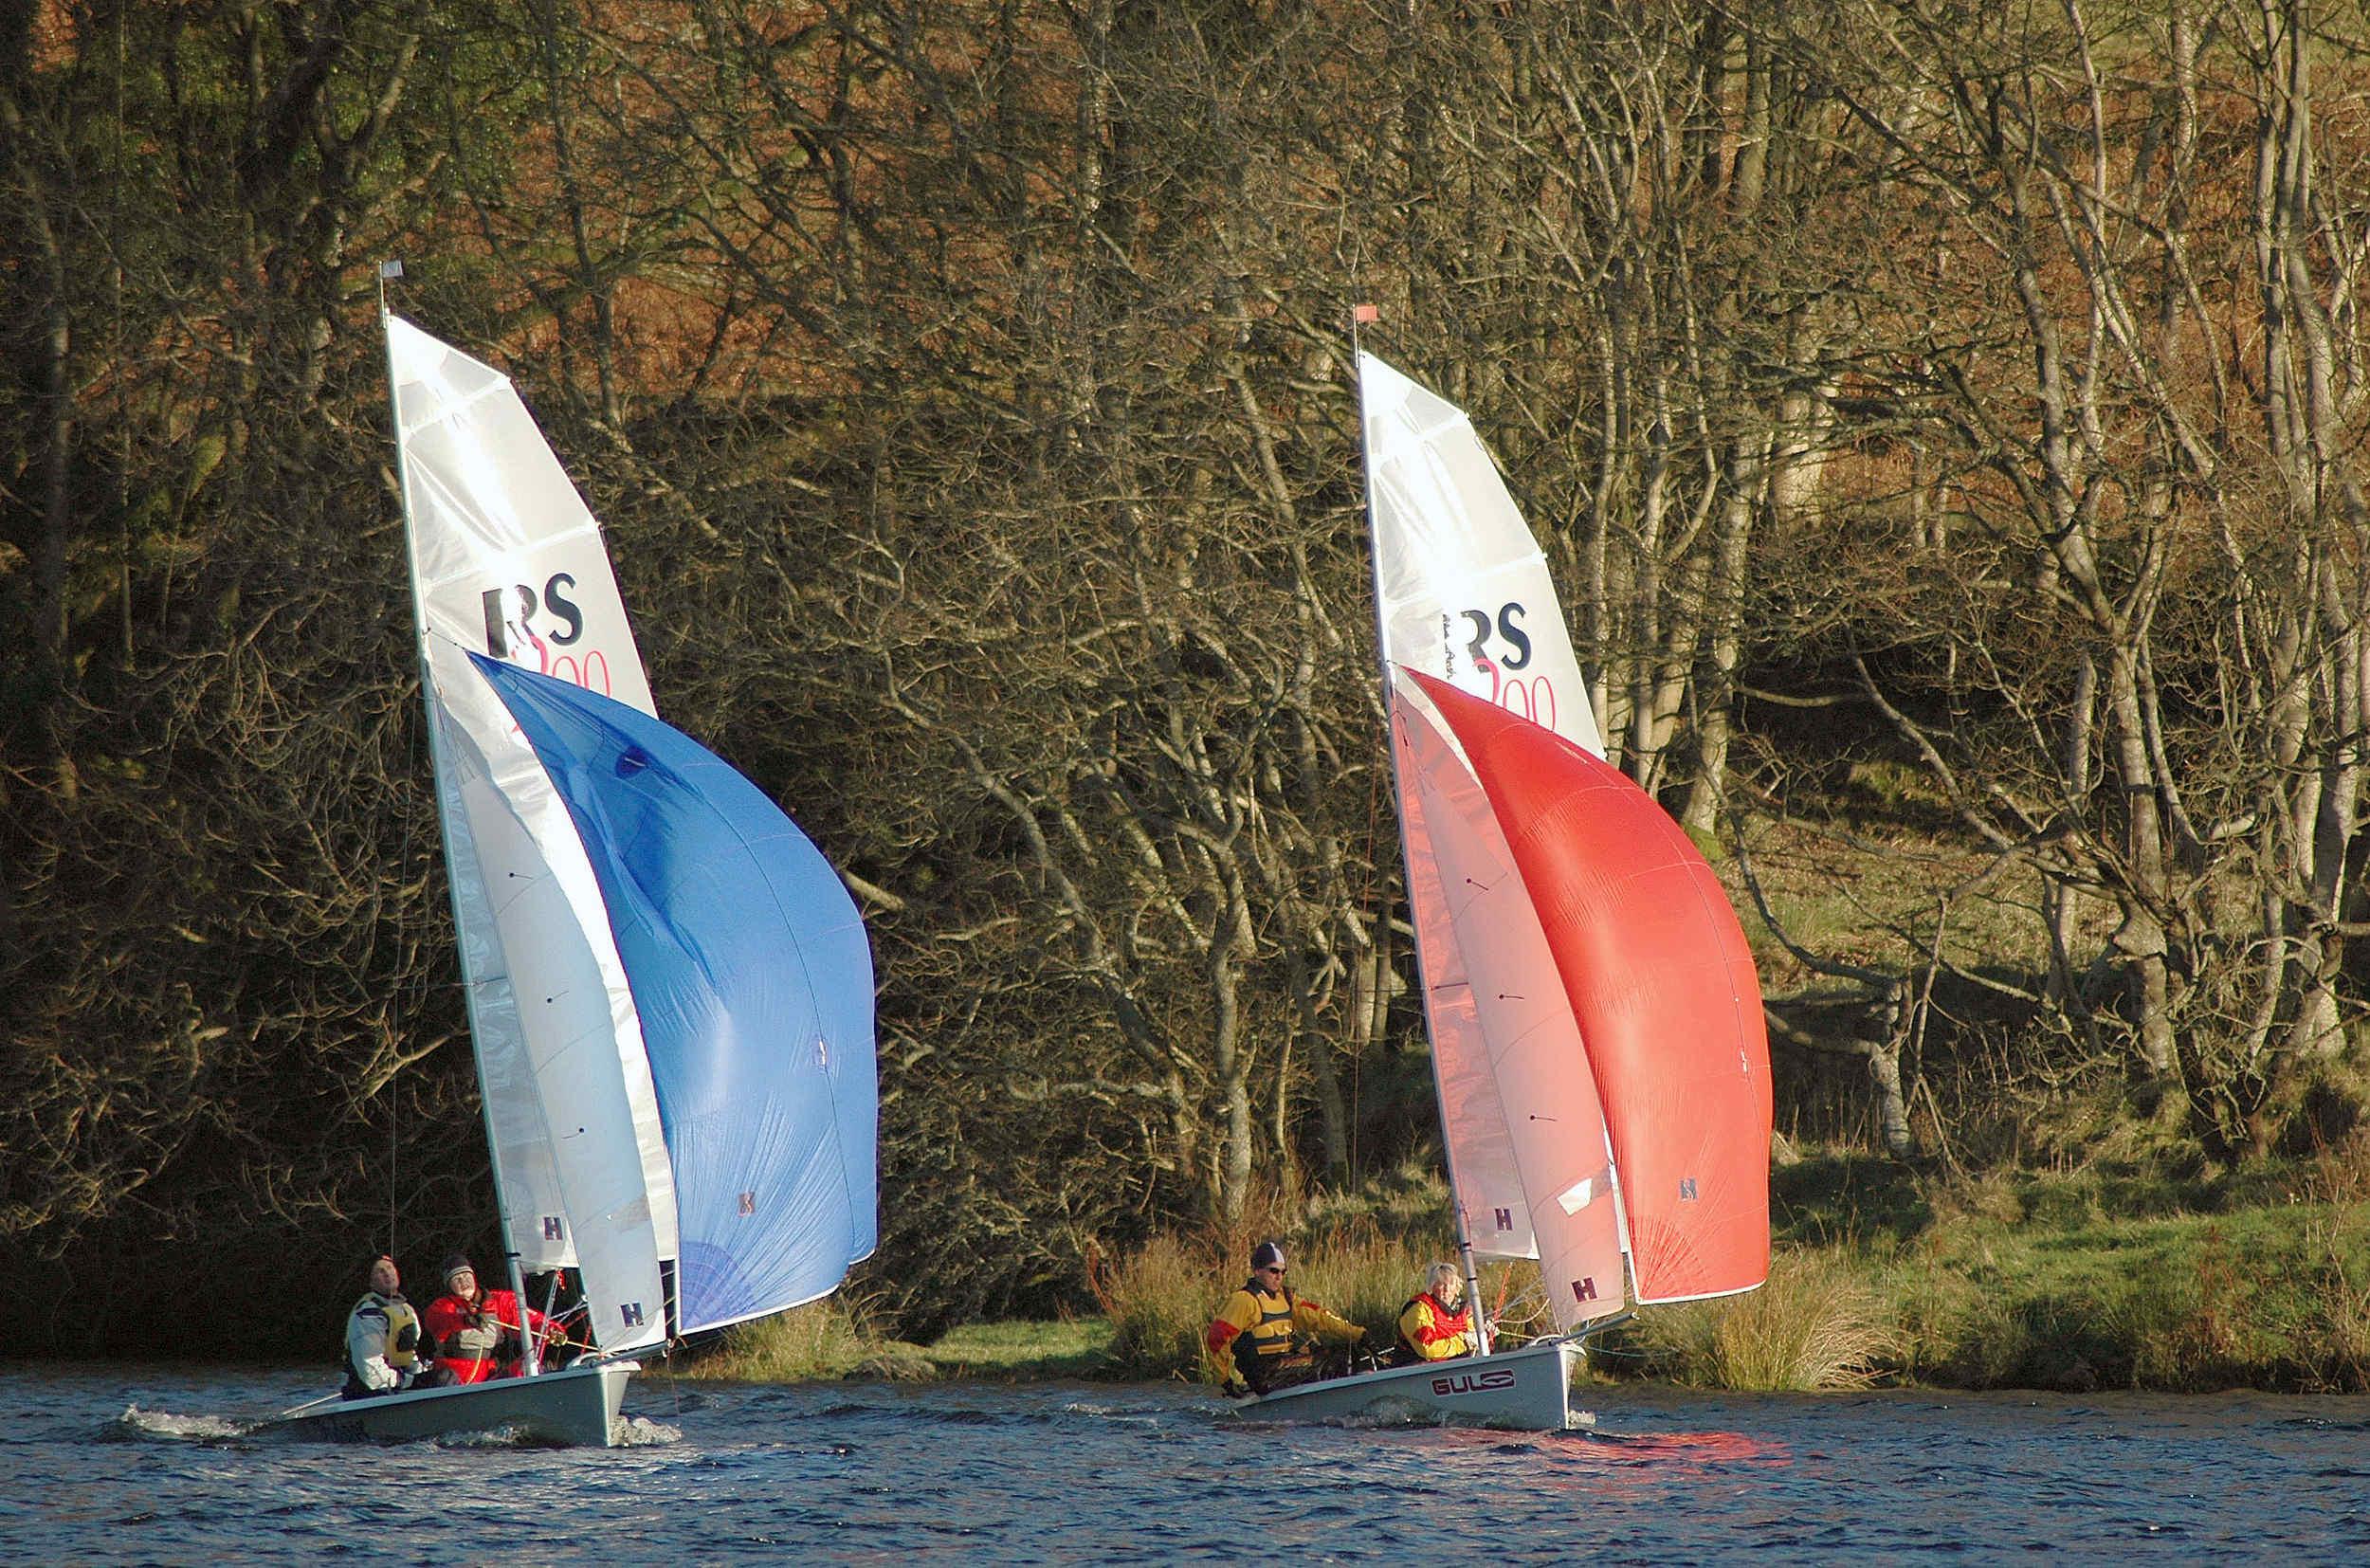 Winter dinghy sailing on West Baldwin reservoir